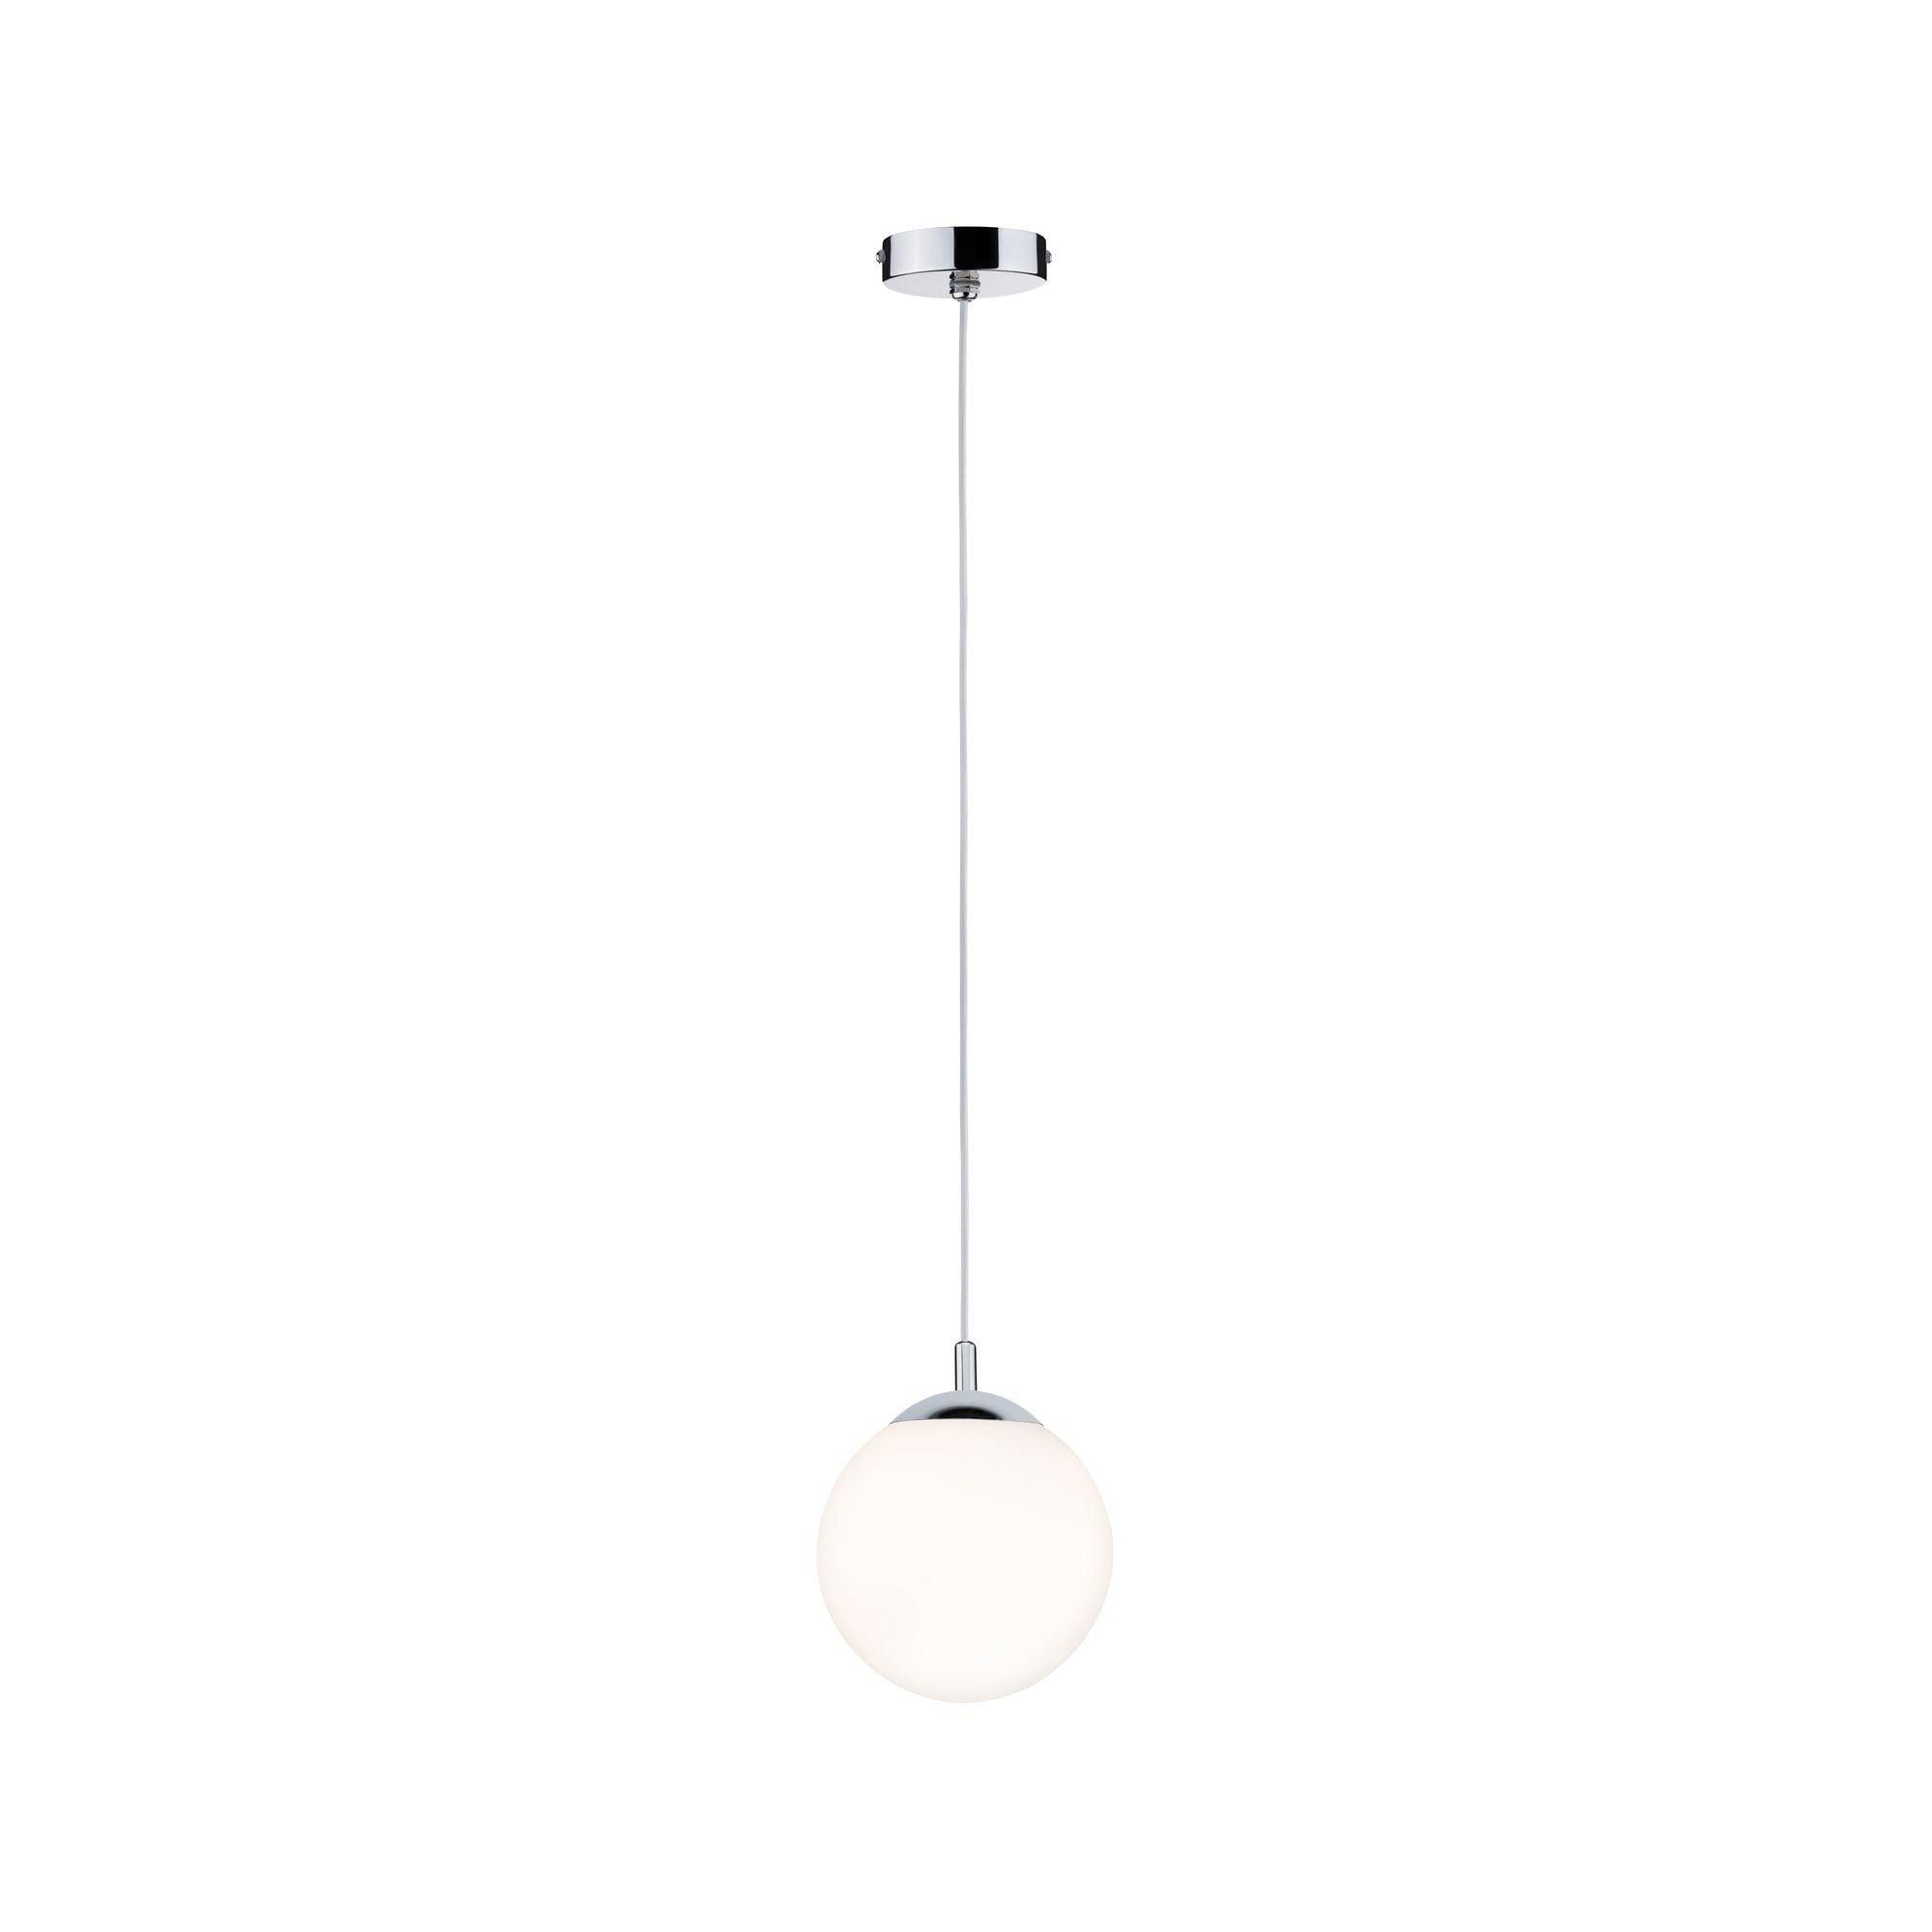 Paulmann,LED Pendelleuchte Globe Satin/Chrom max. 20W E27